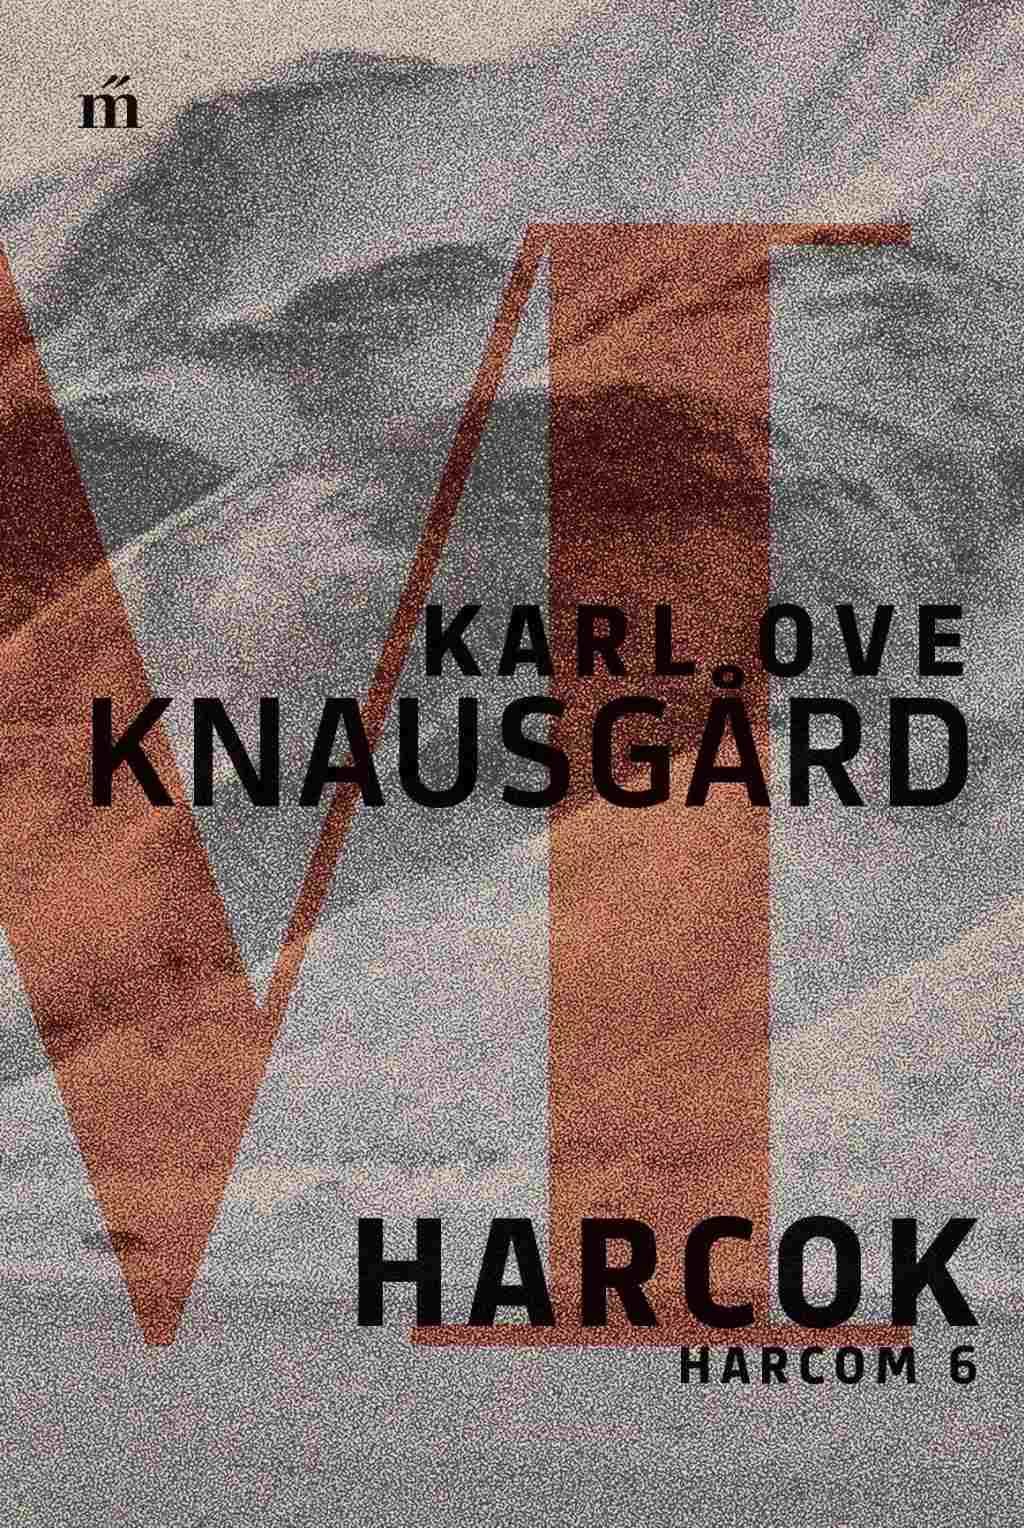 Knausgard, Karl Ove - Harcok - Harcom 6.